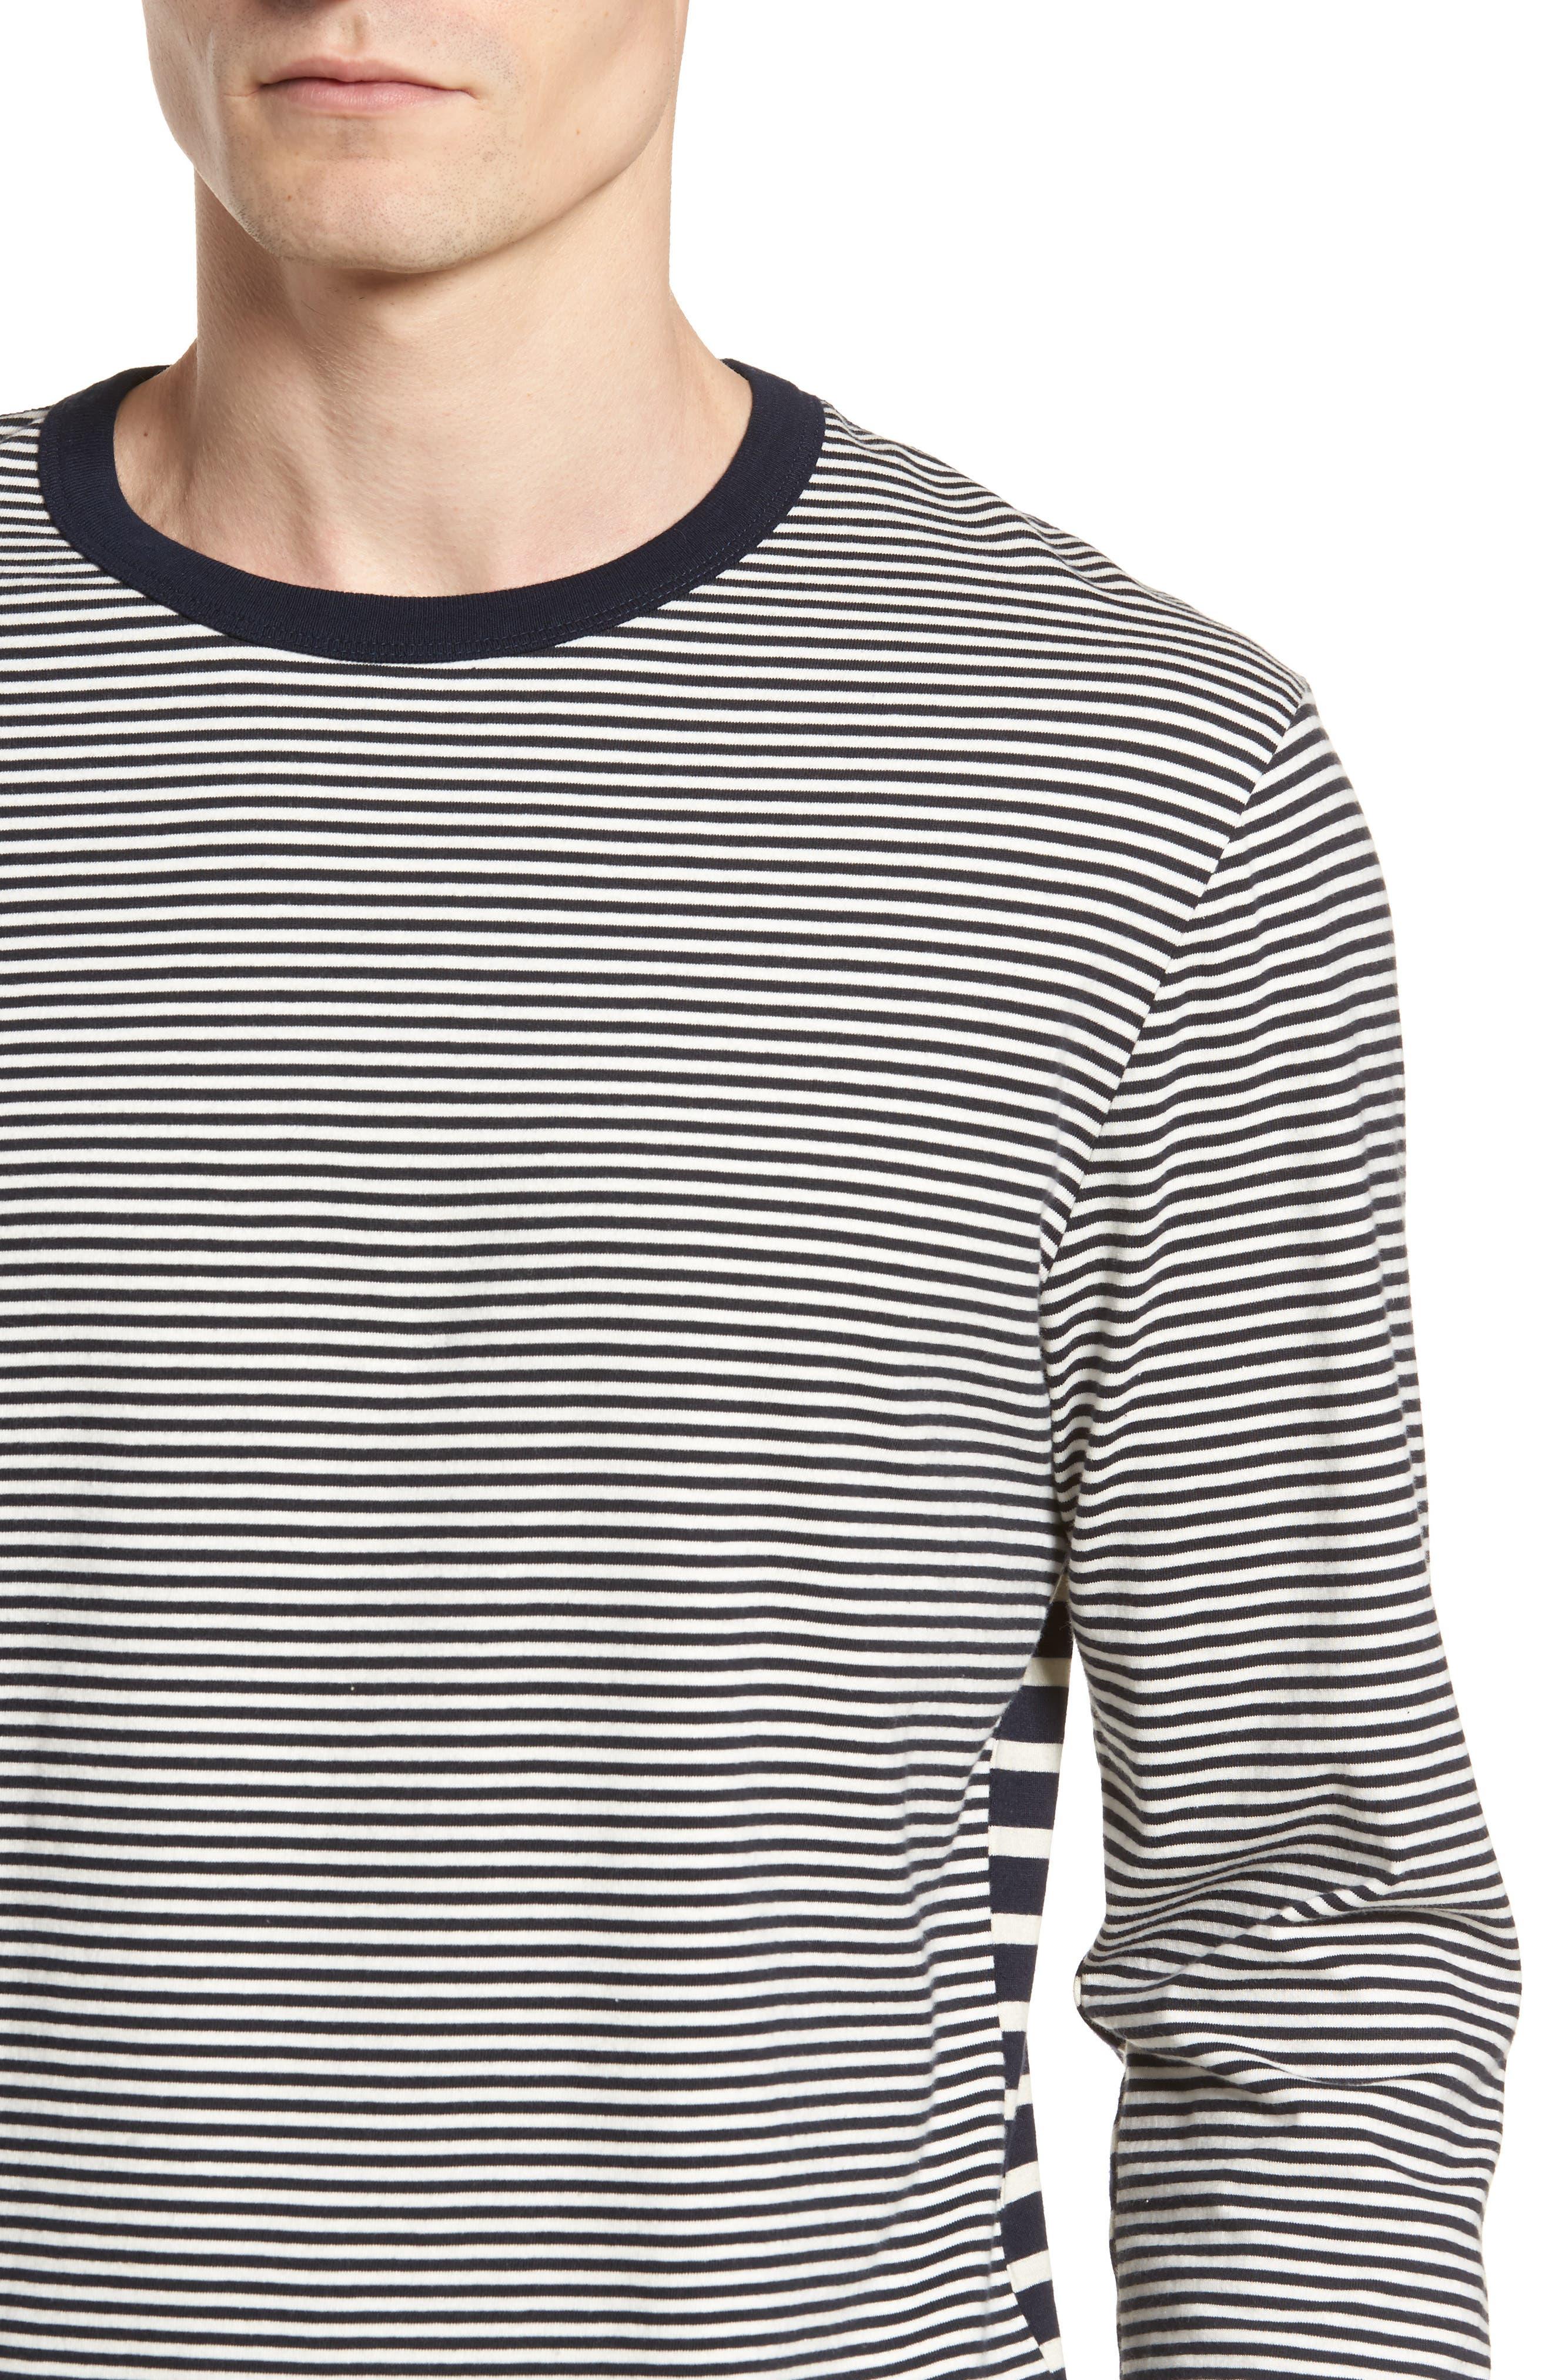 Mix Stripe Long Sleeve T-Shirt,                             Alternate thumbnail 4, color,                             020